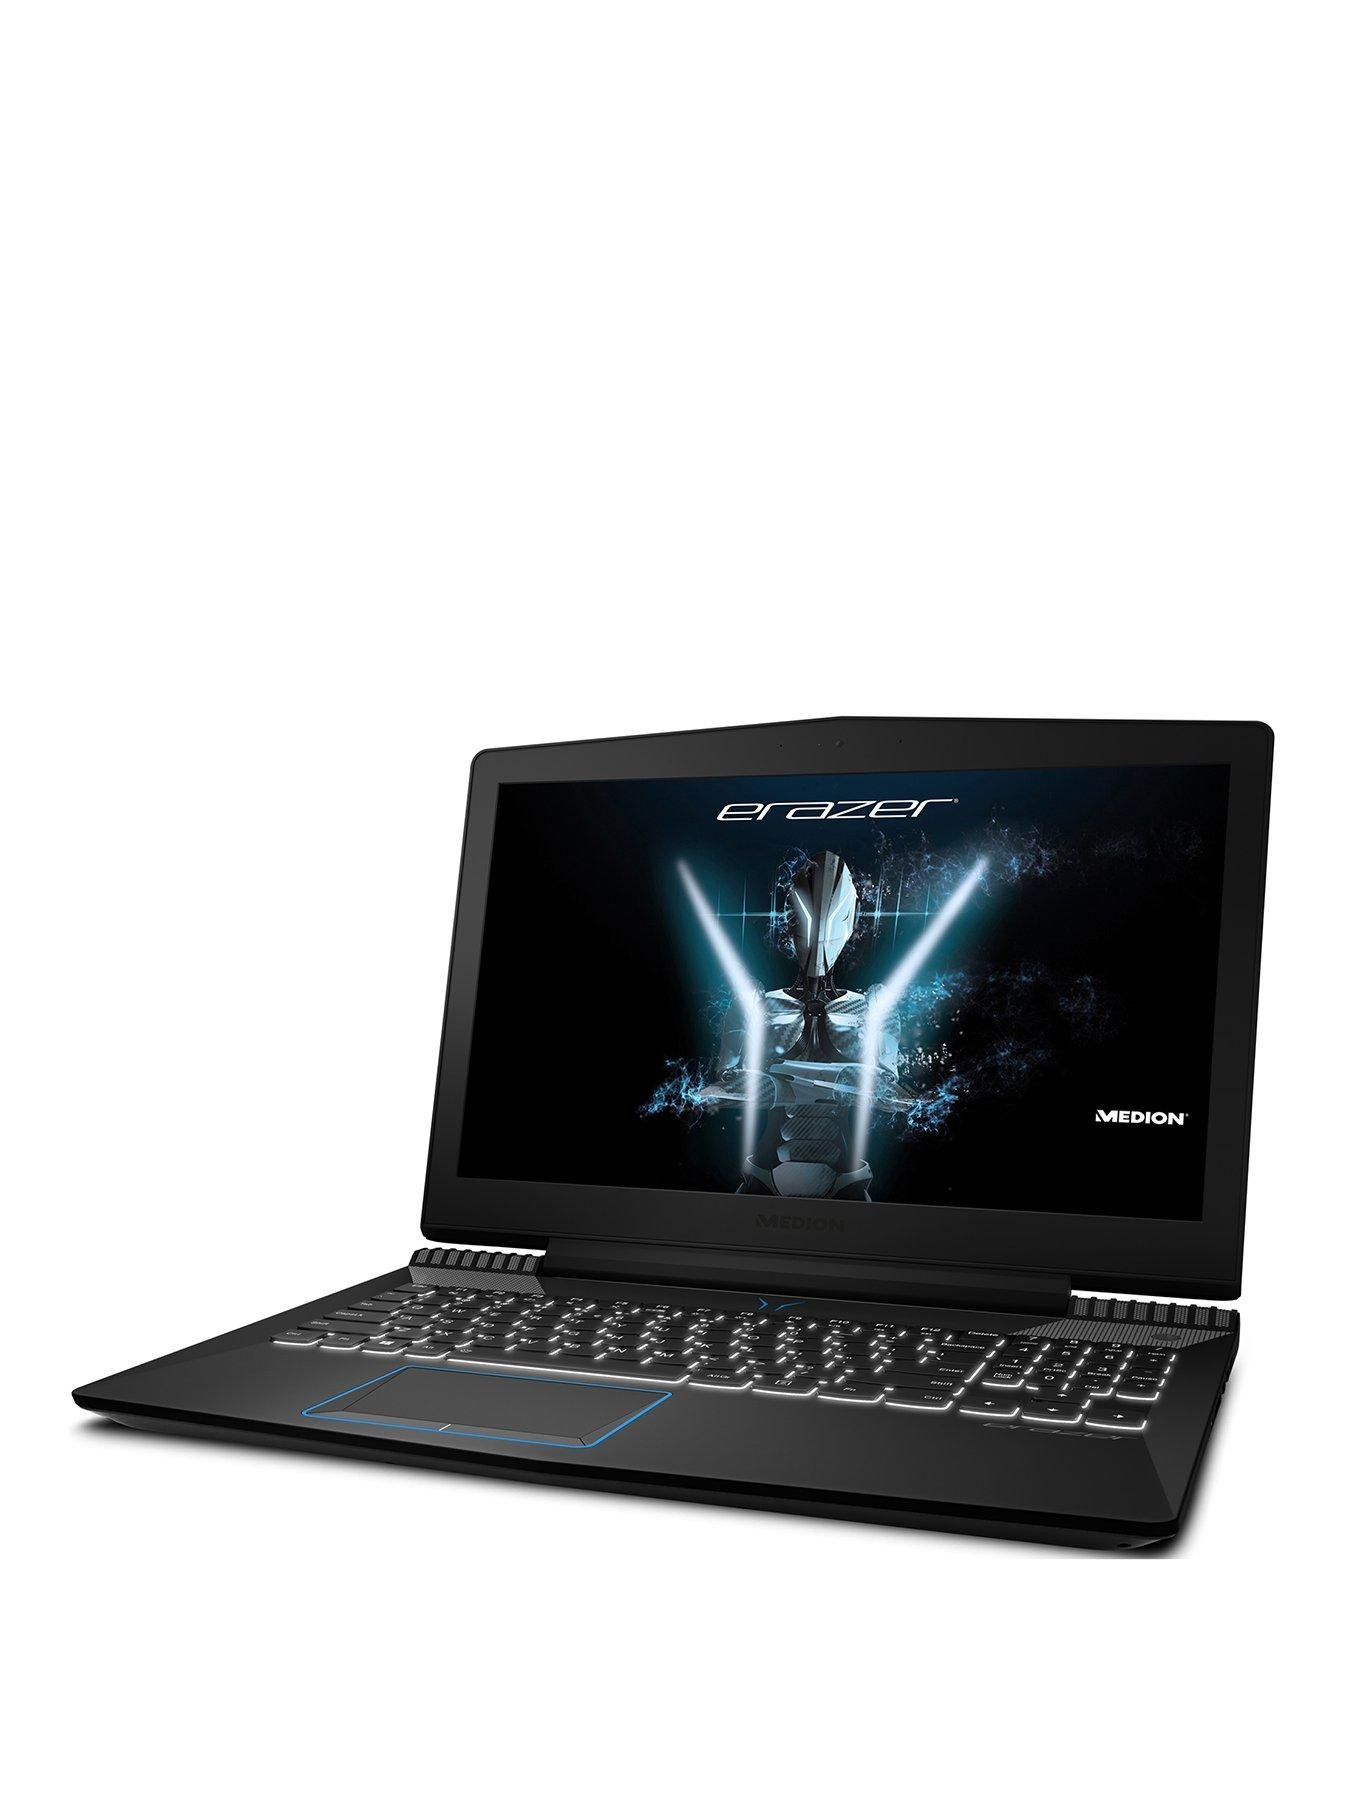 Medion ERAZER 15.5インチゲーミングノートパソコン - バリアント30022556 Intel Core i7、1TB + 256GB  -  GTX 1050Ti 4GB